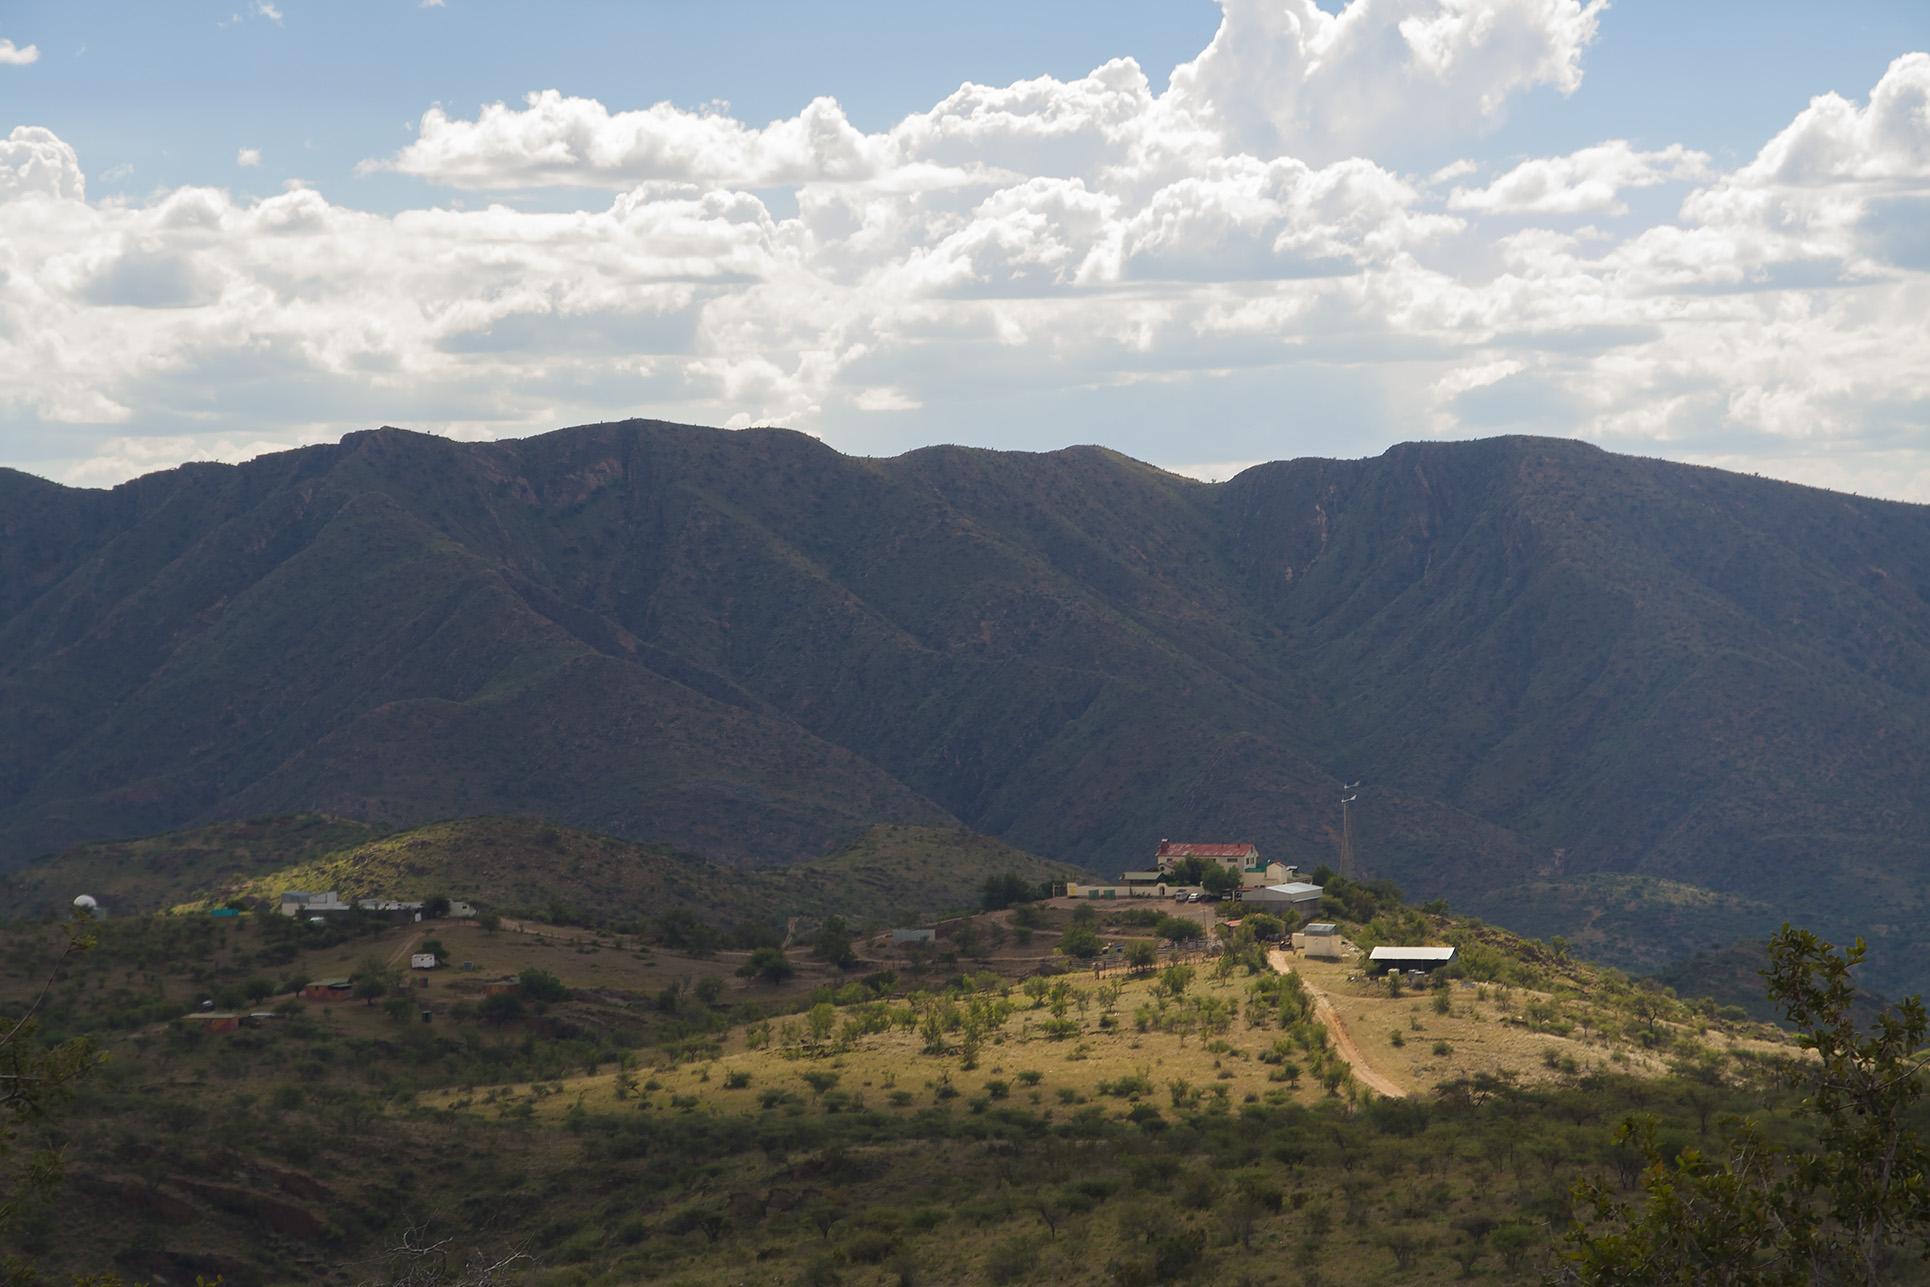 Hakos farm, Namíbia